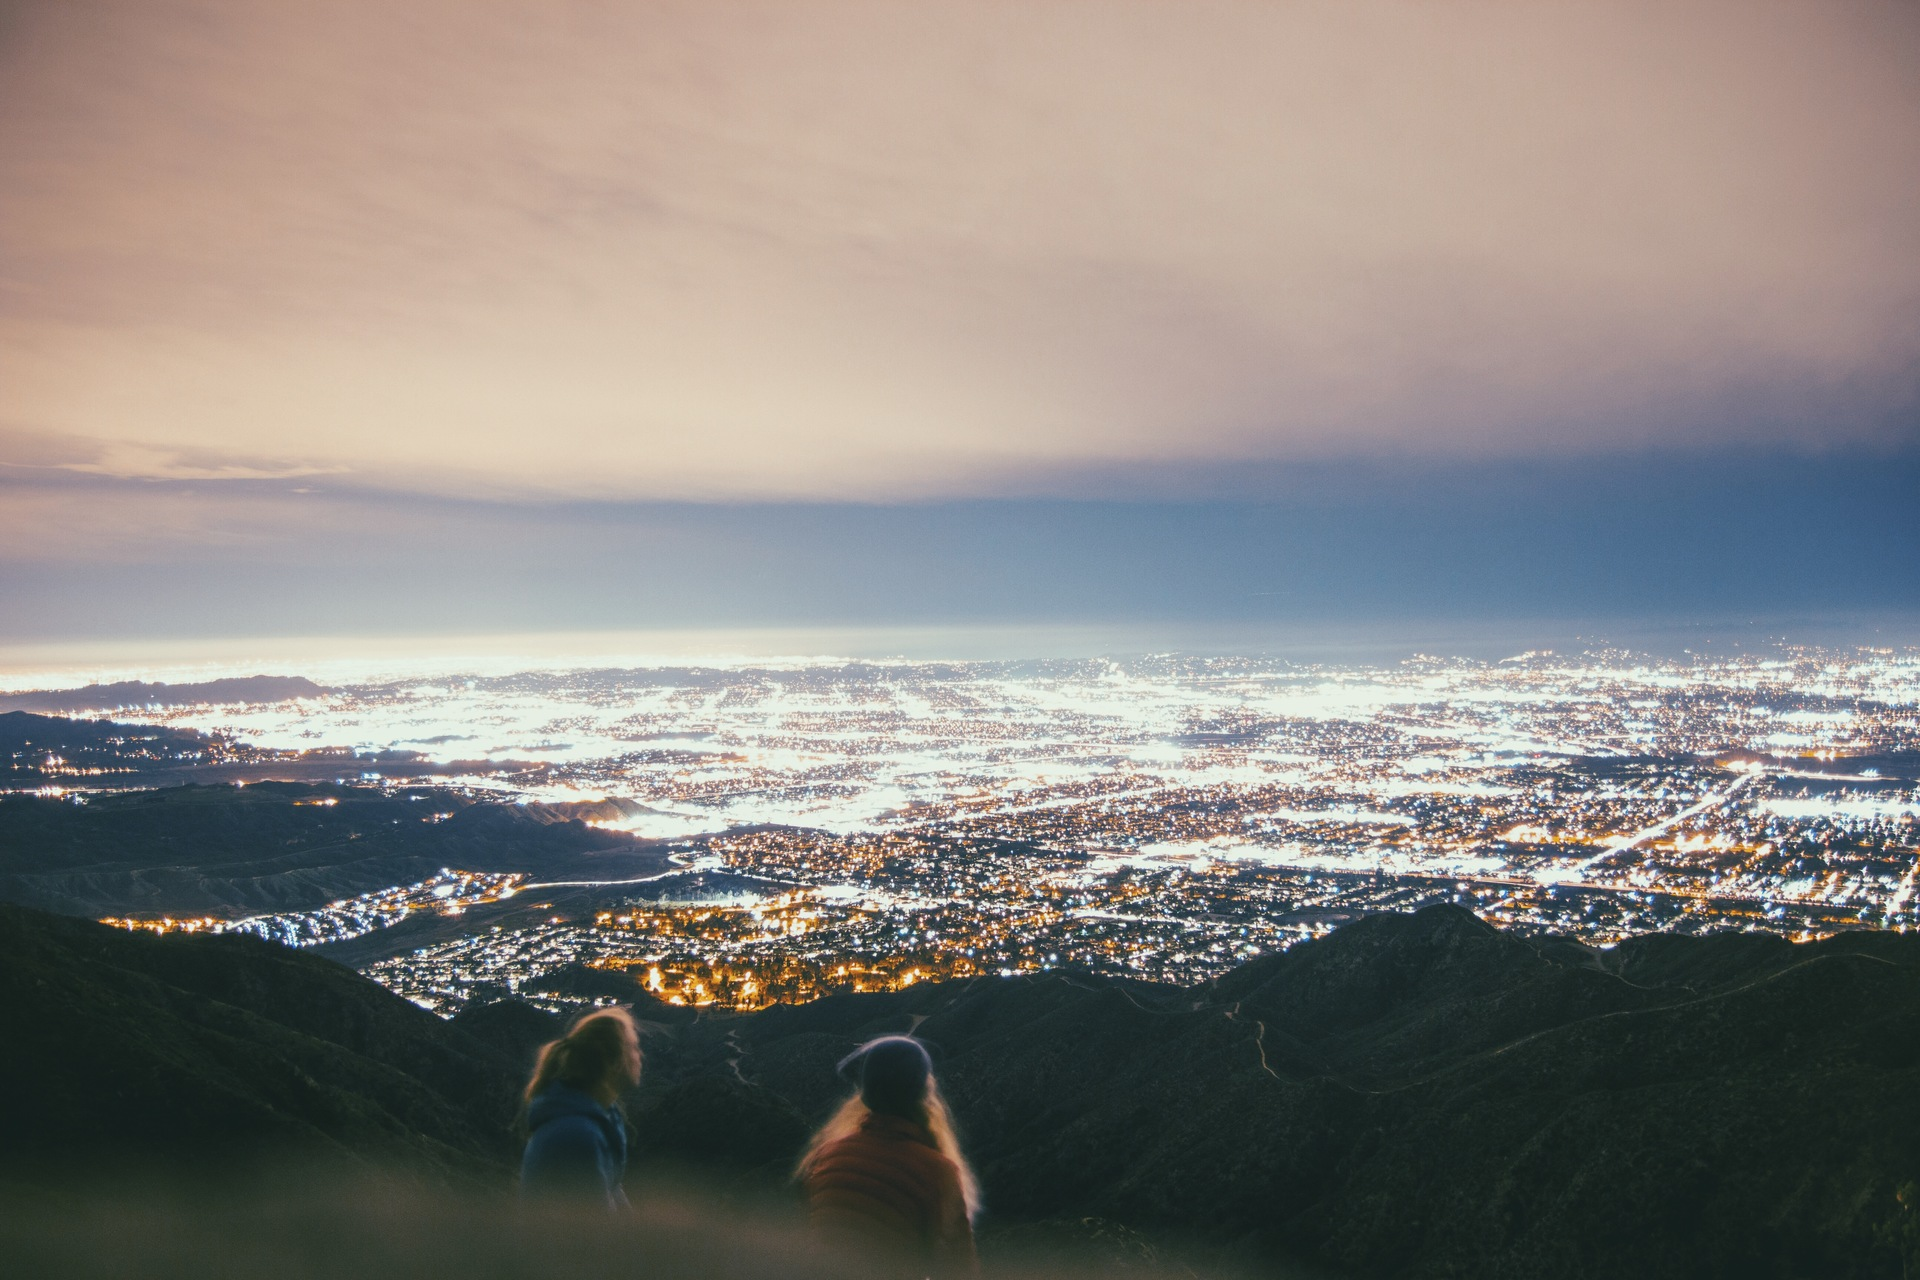 Los Angeles   davidpenna313, city, dusk, mountain